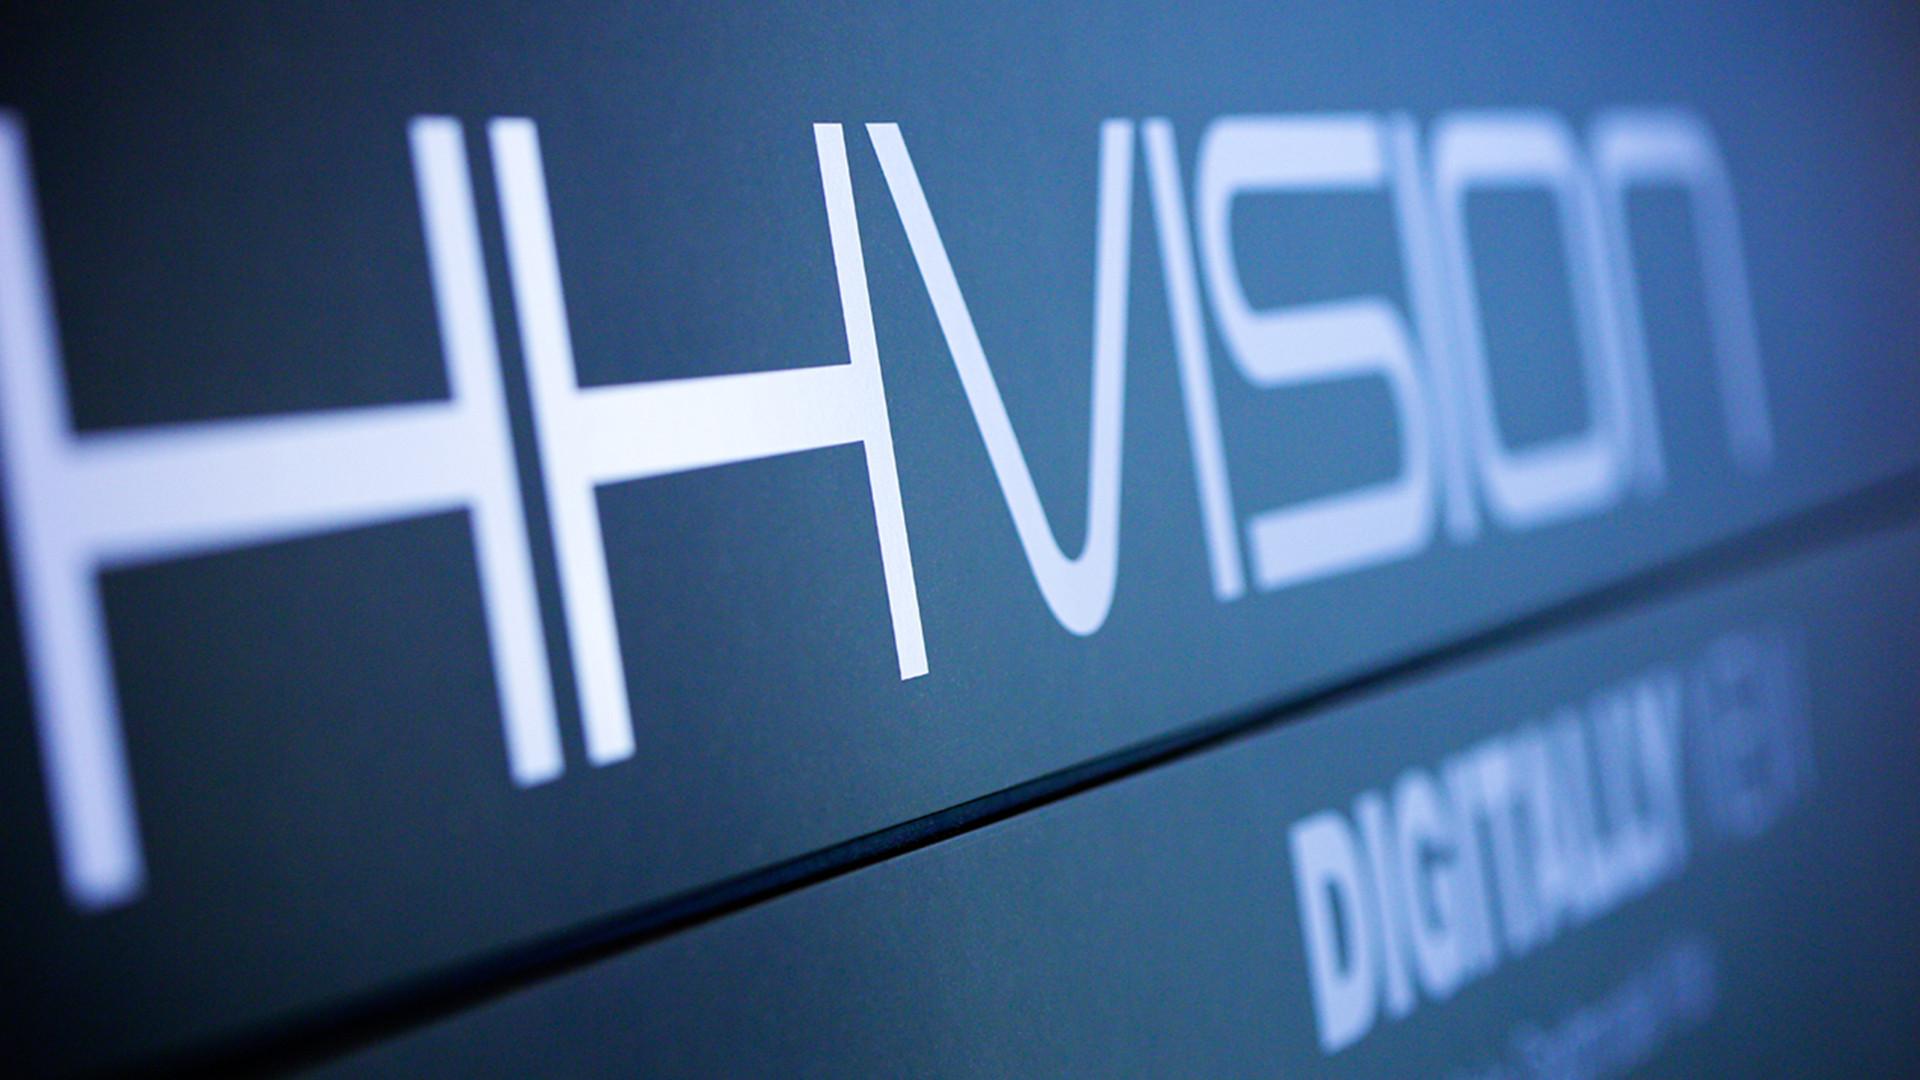 HHVISION